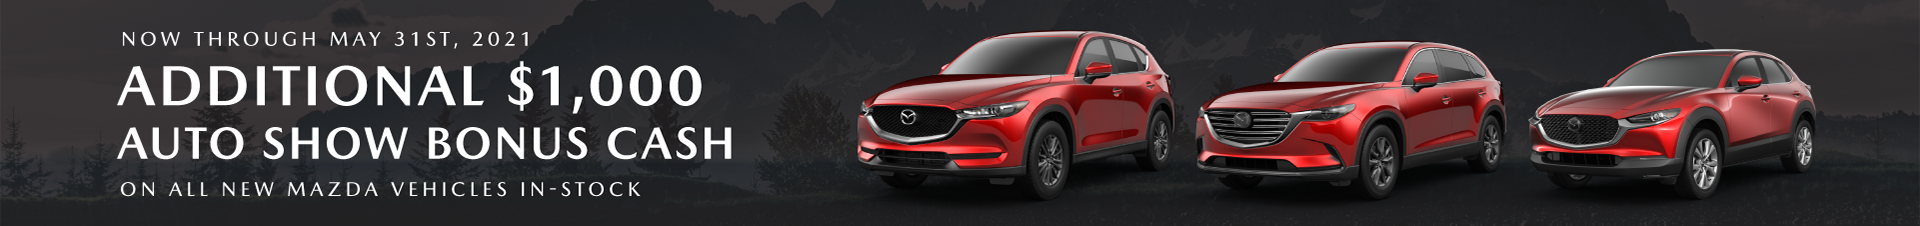 Mtka Mazda_auto-show_banner_desktop_0421